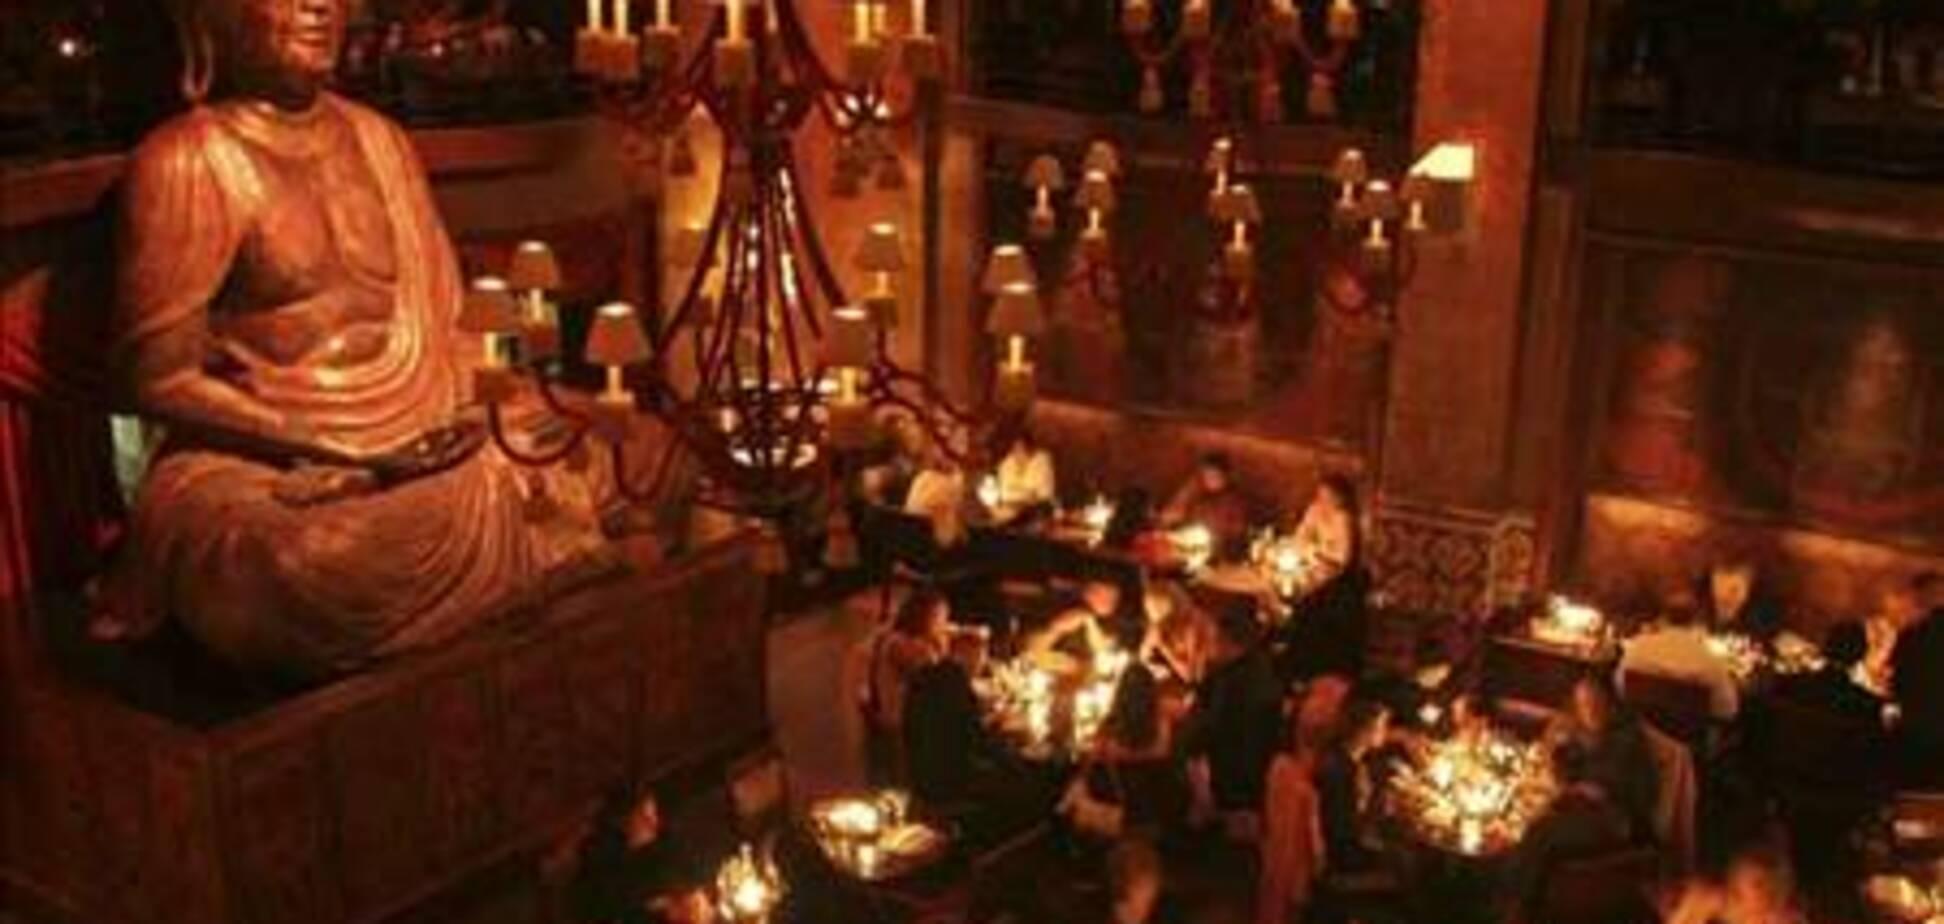 'Indian party' в лаунж-ресторане 'Buddha-bar Kiev'